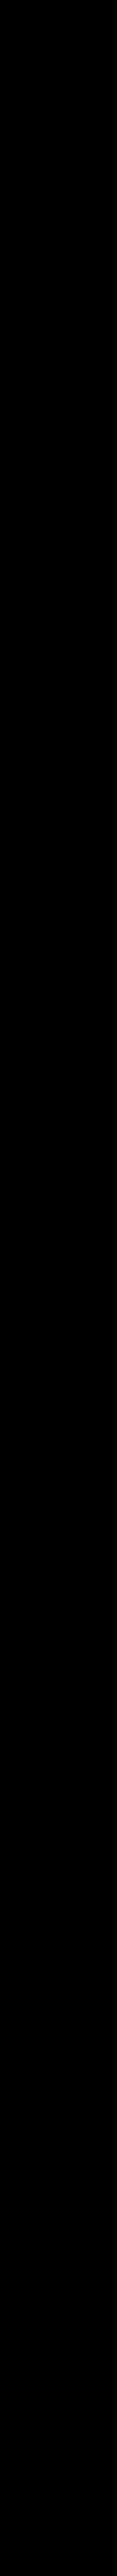 SolidBlack 350x7700 25KB